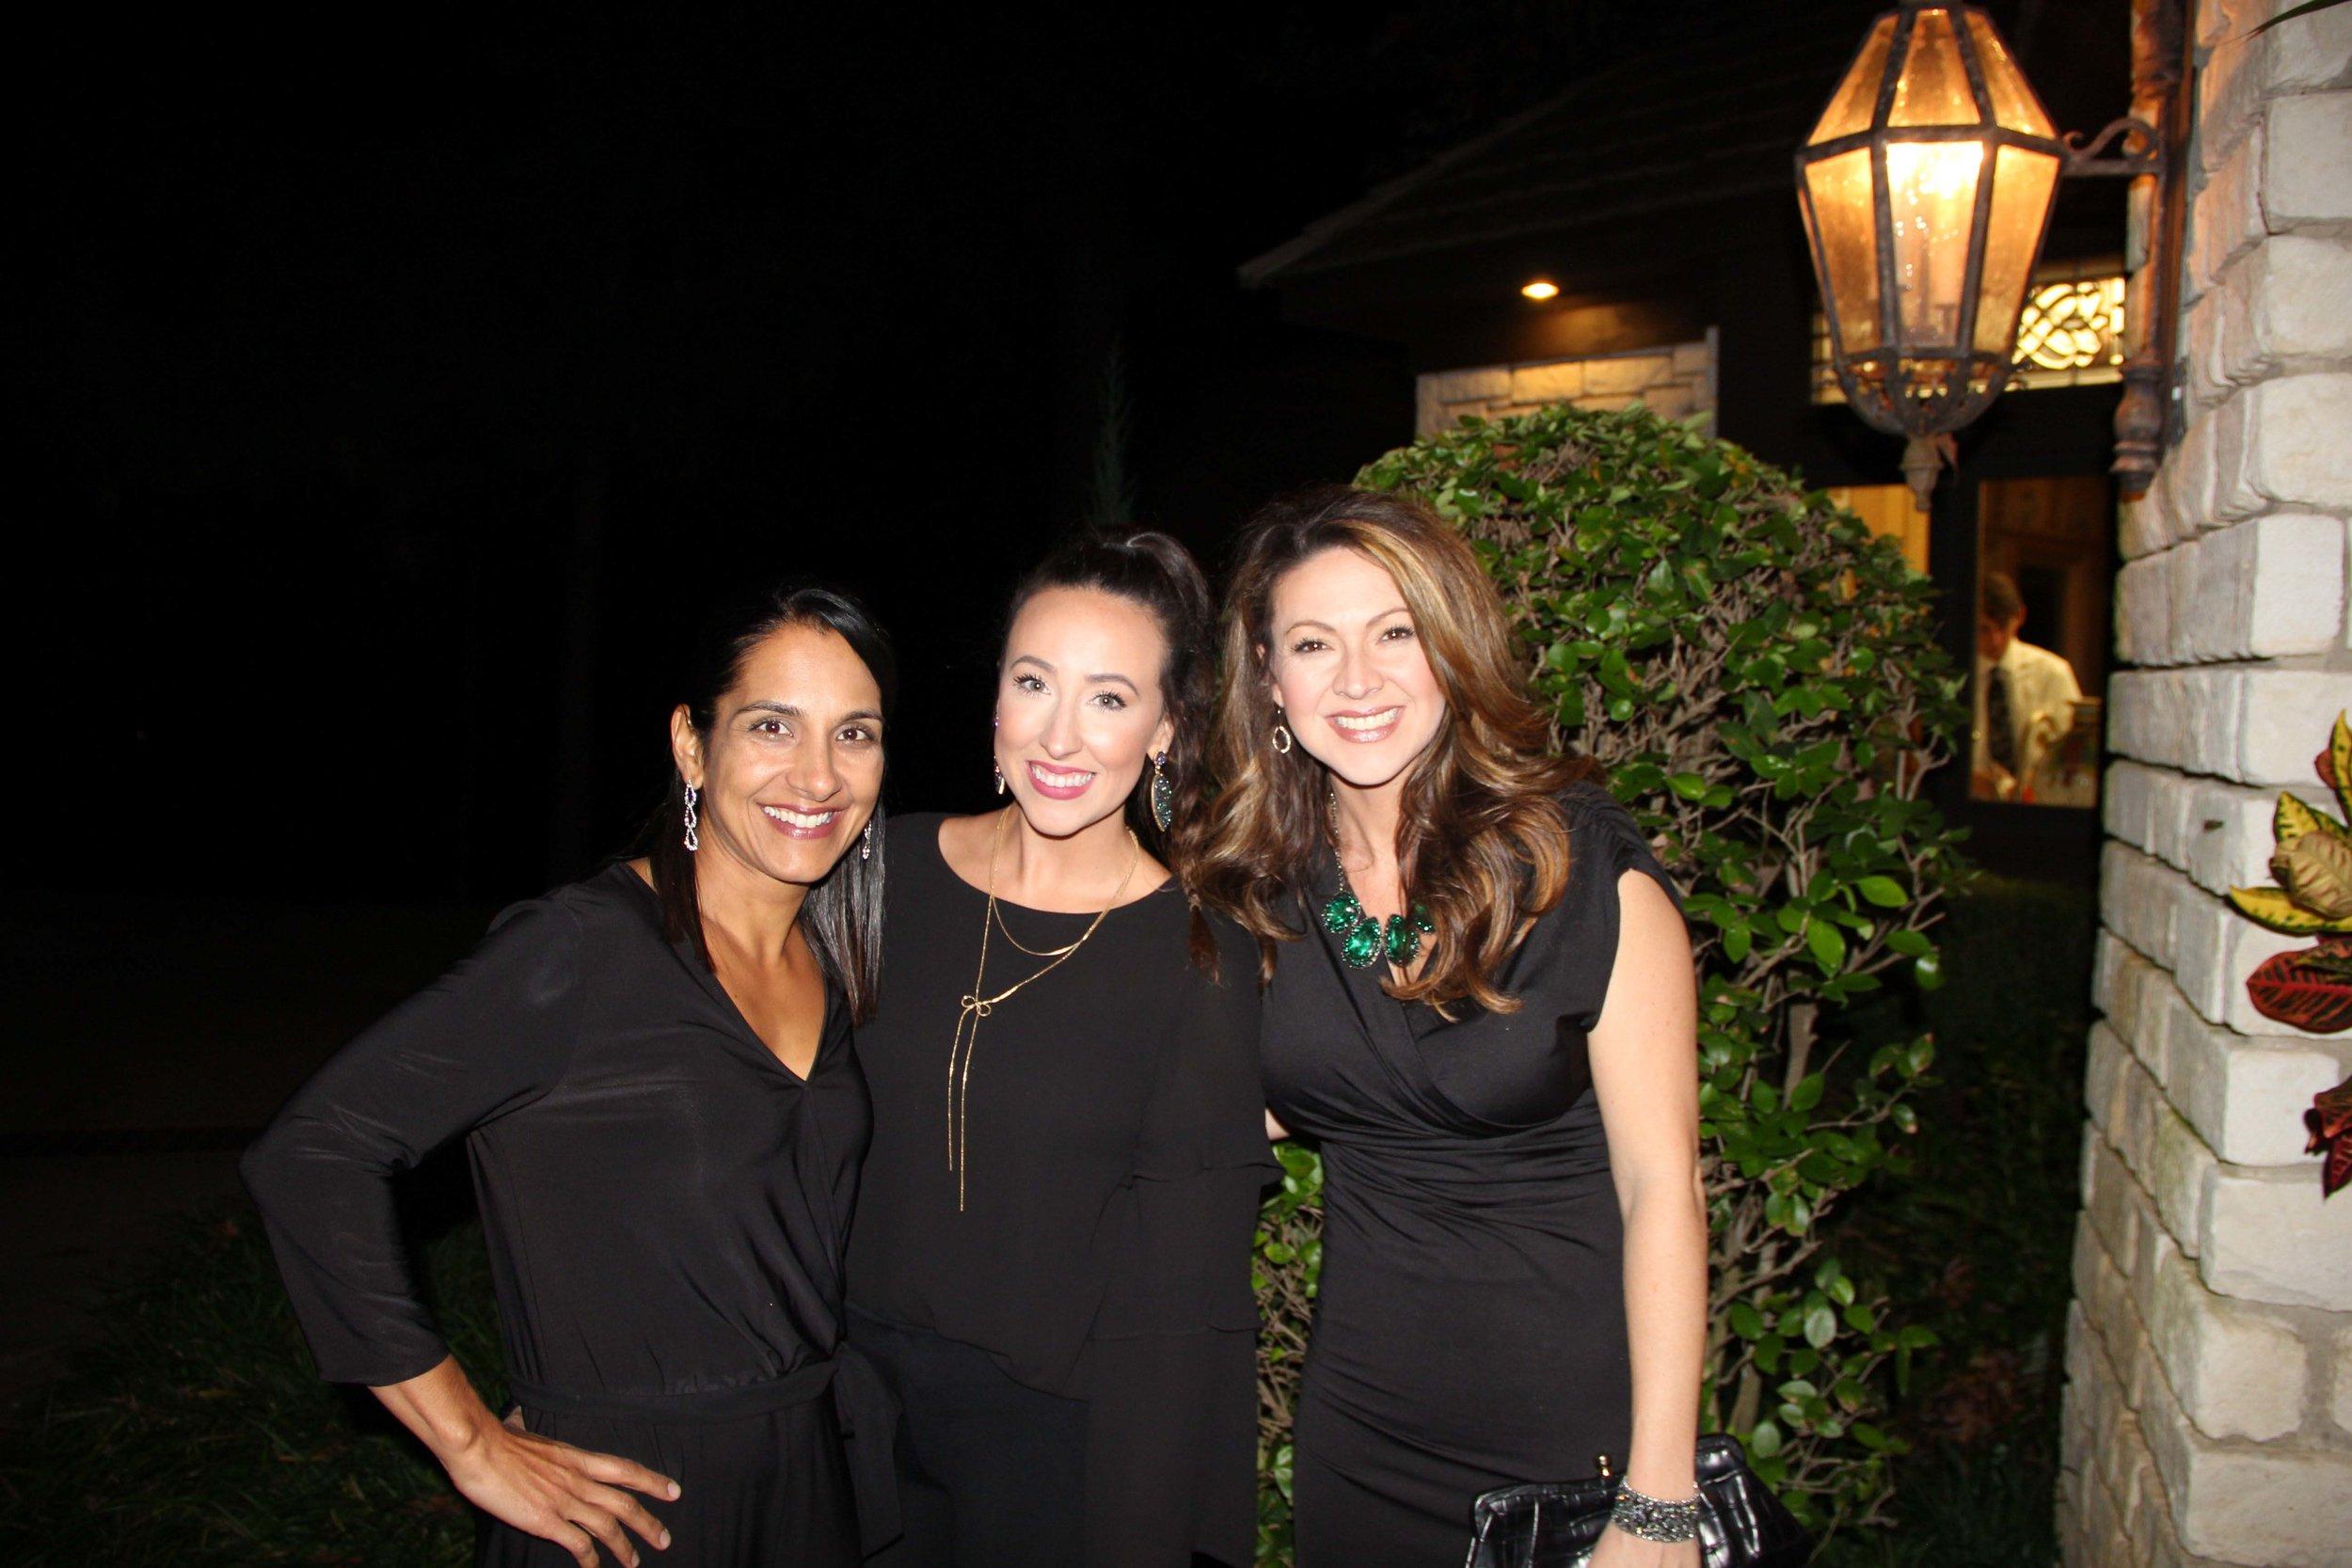 Anitha Kurichety, Whitney Brooks and Stacy Mayo